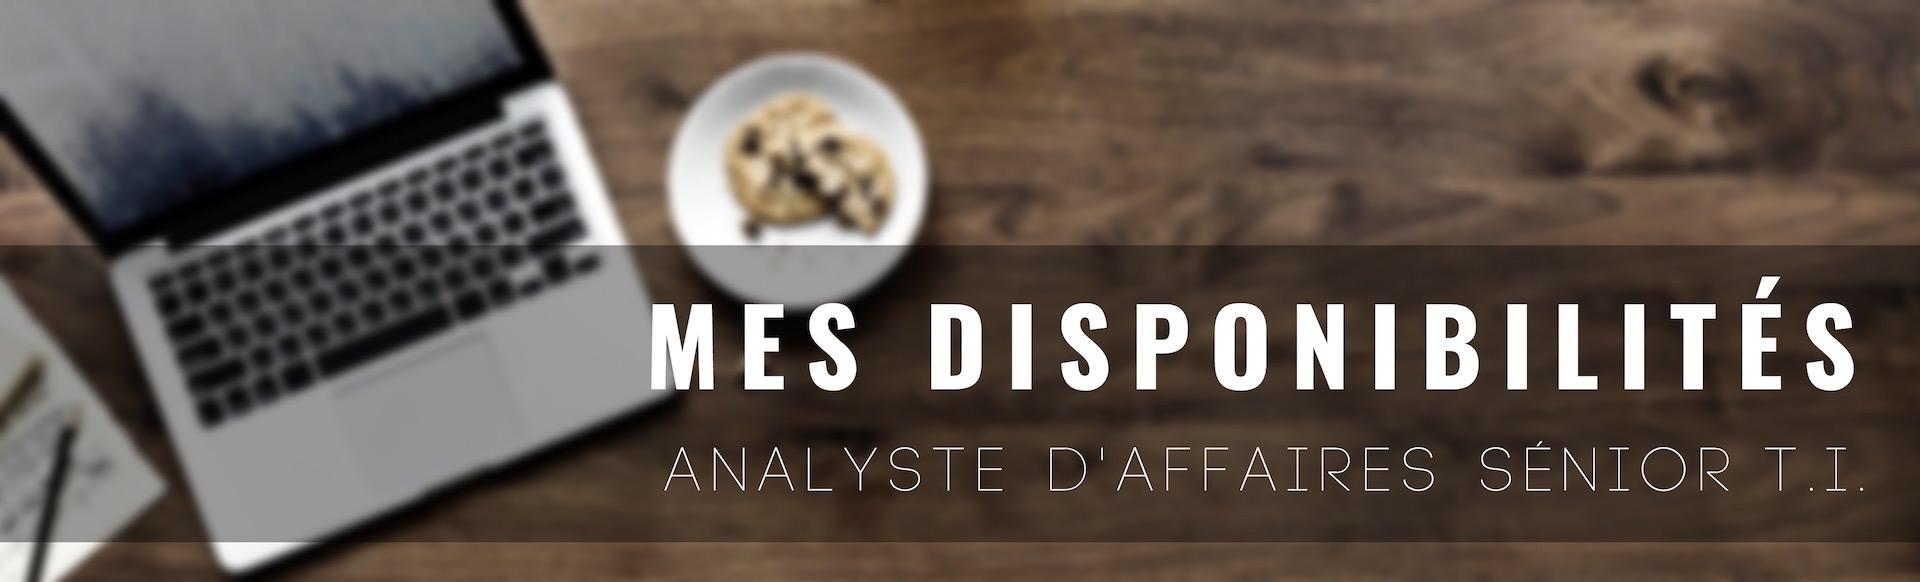 dispo-analyste-affaires-pascal